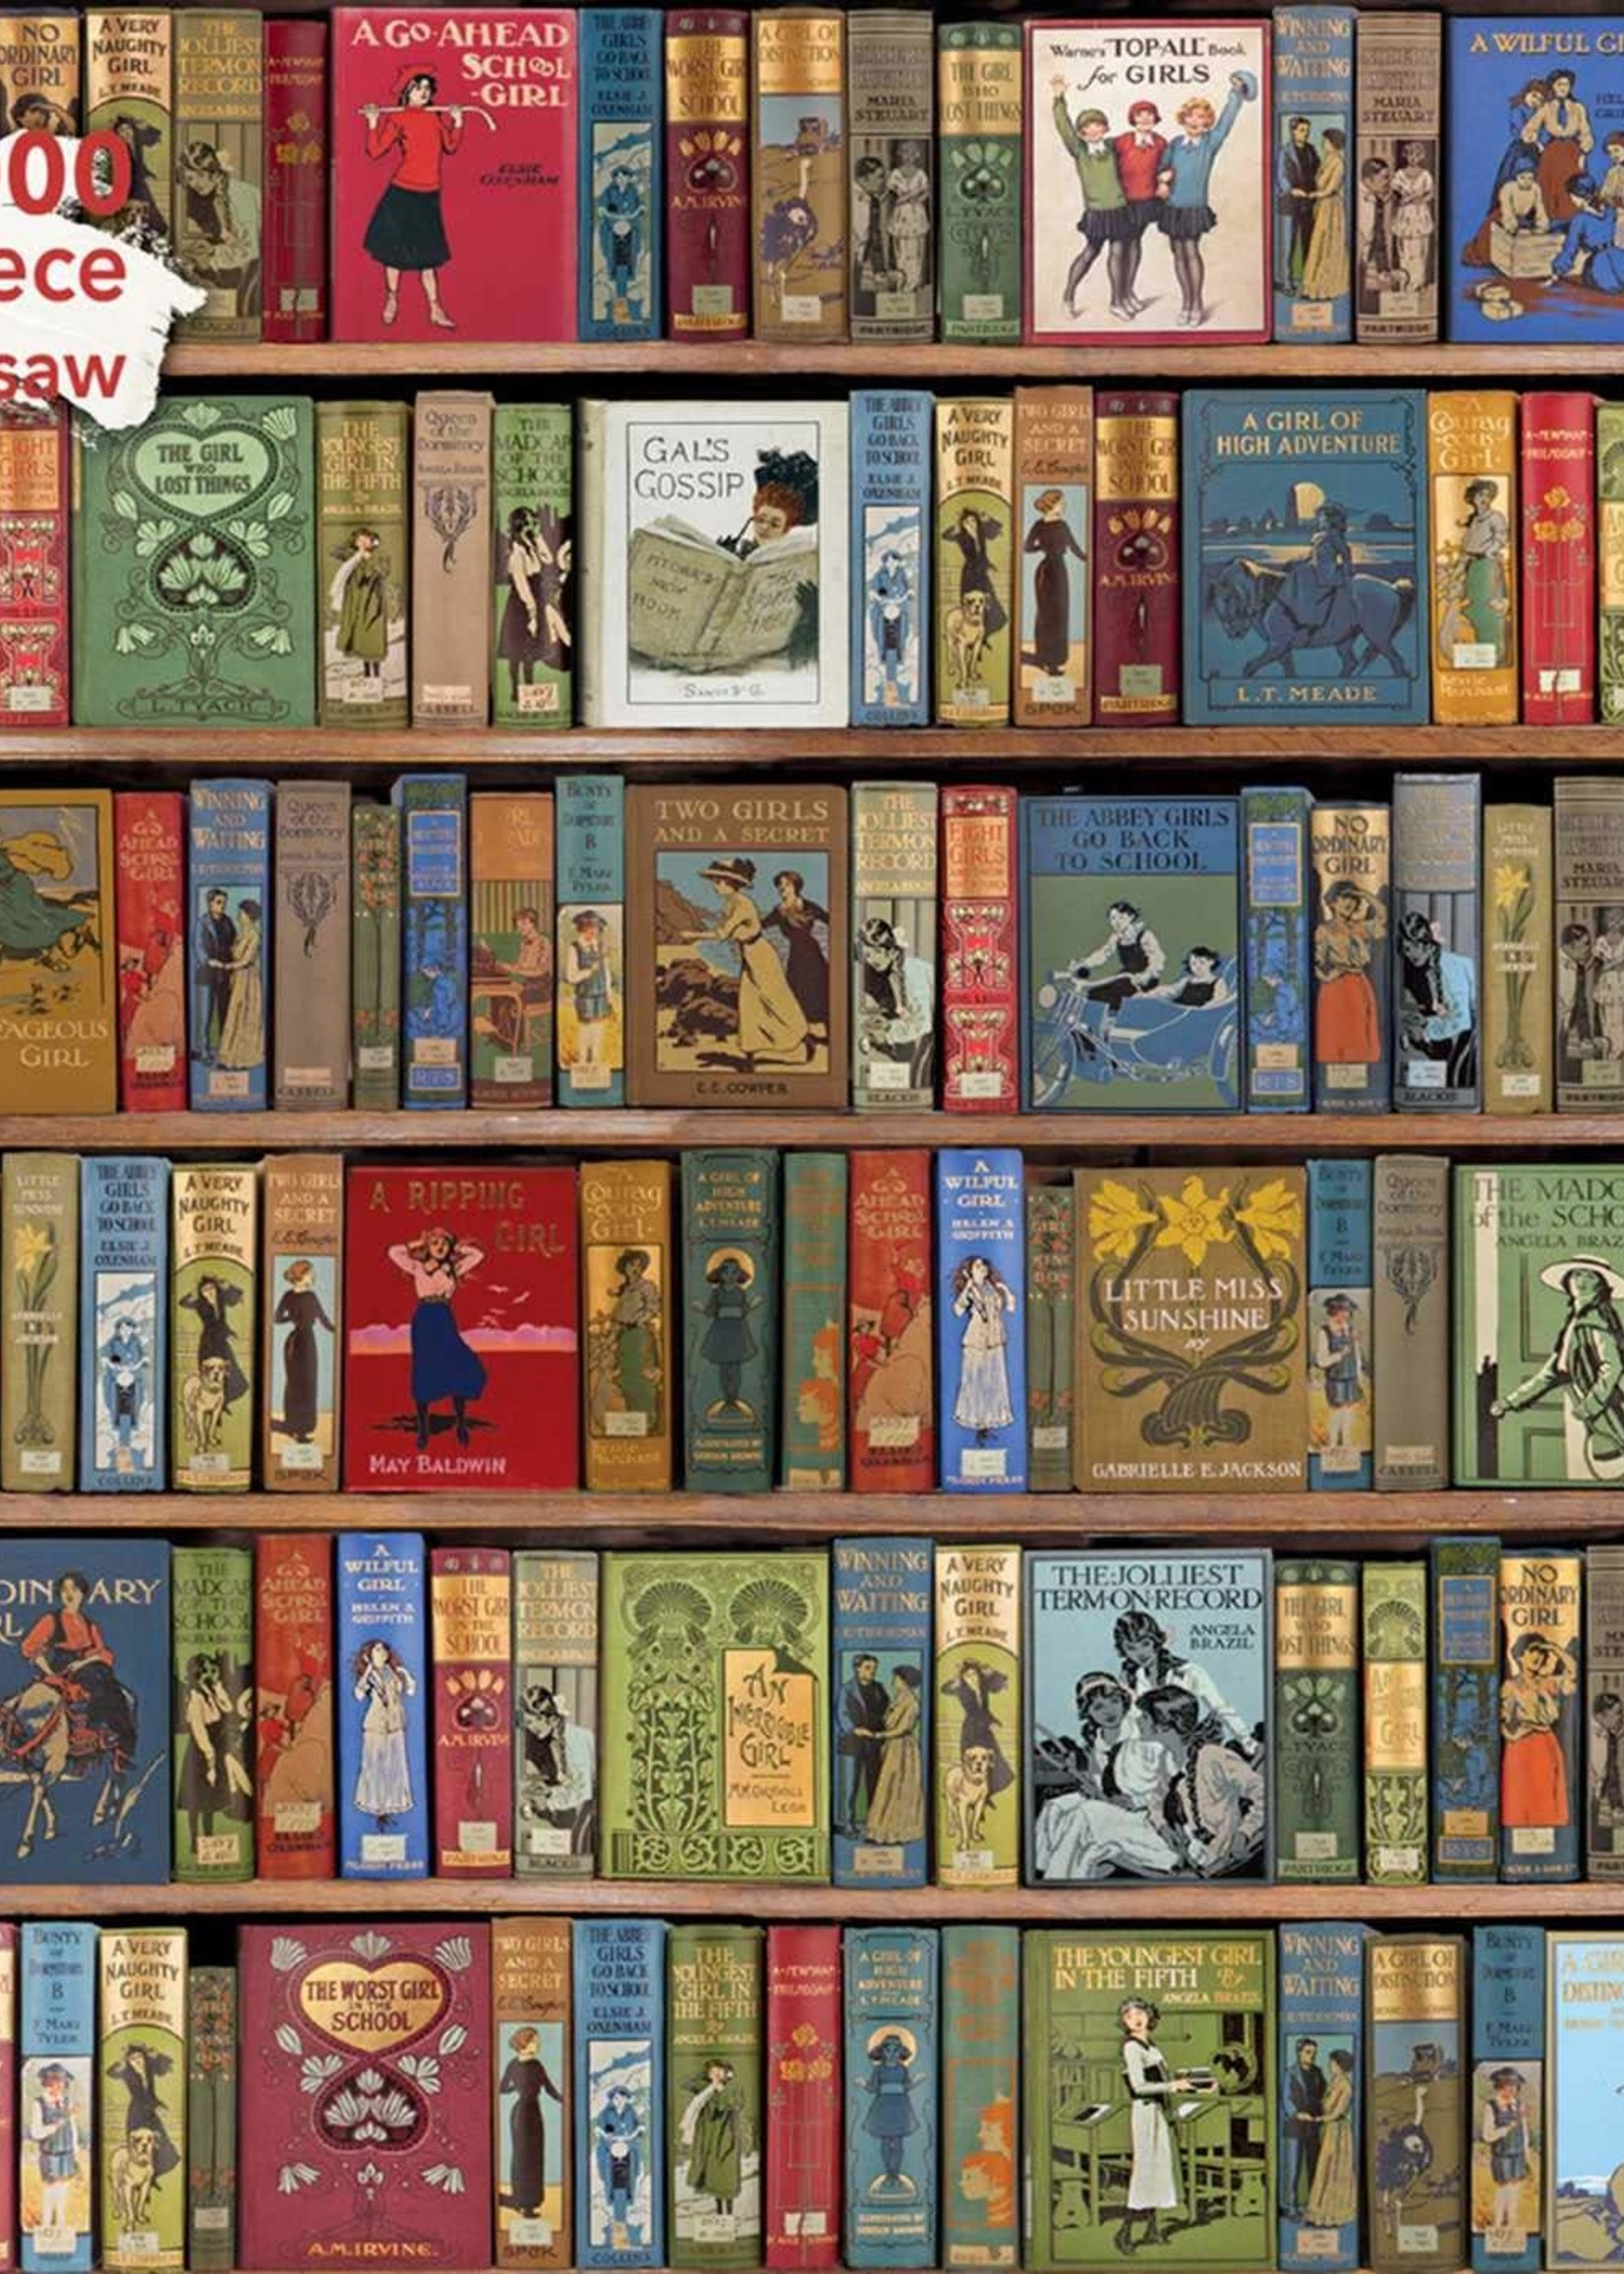 Bodleian Libraries Bookshelves 1000pc Puzze